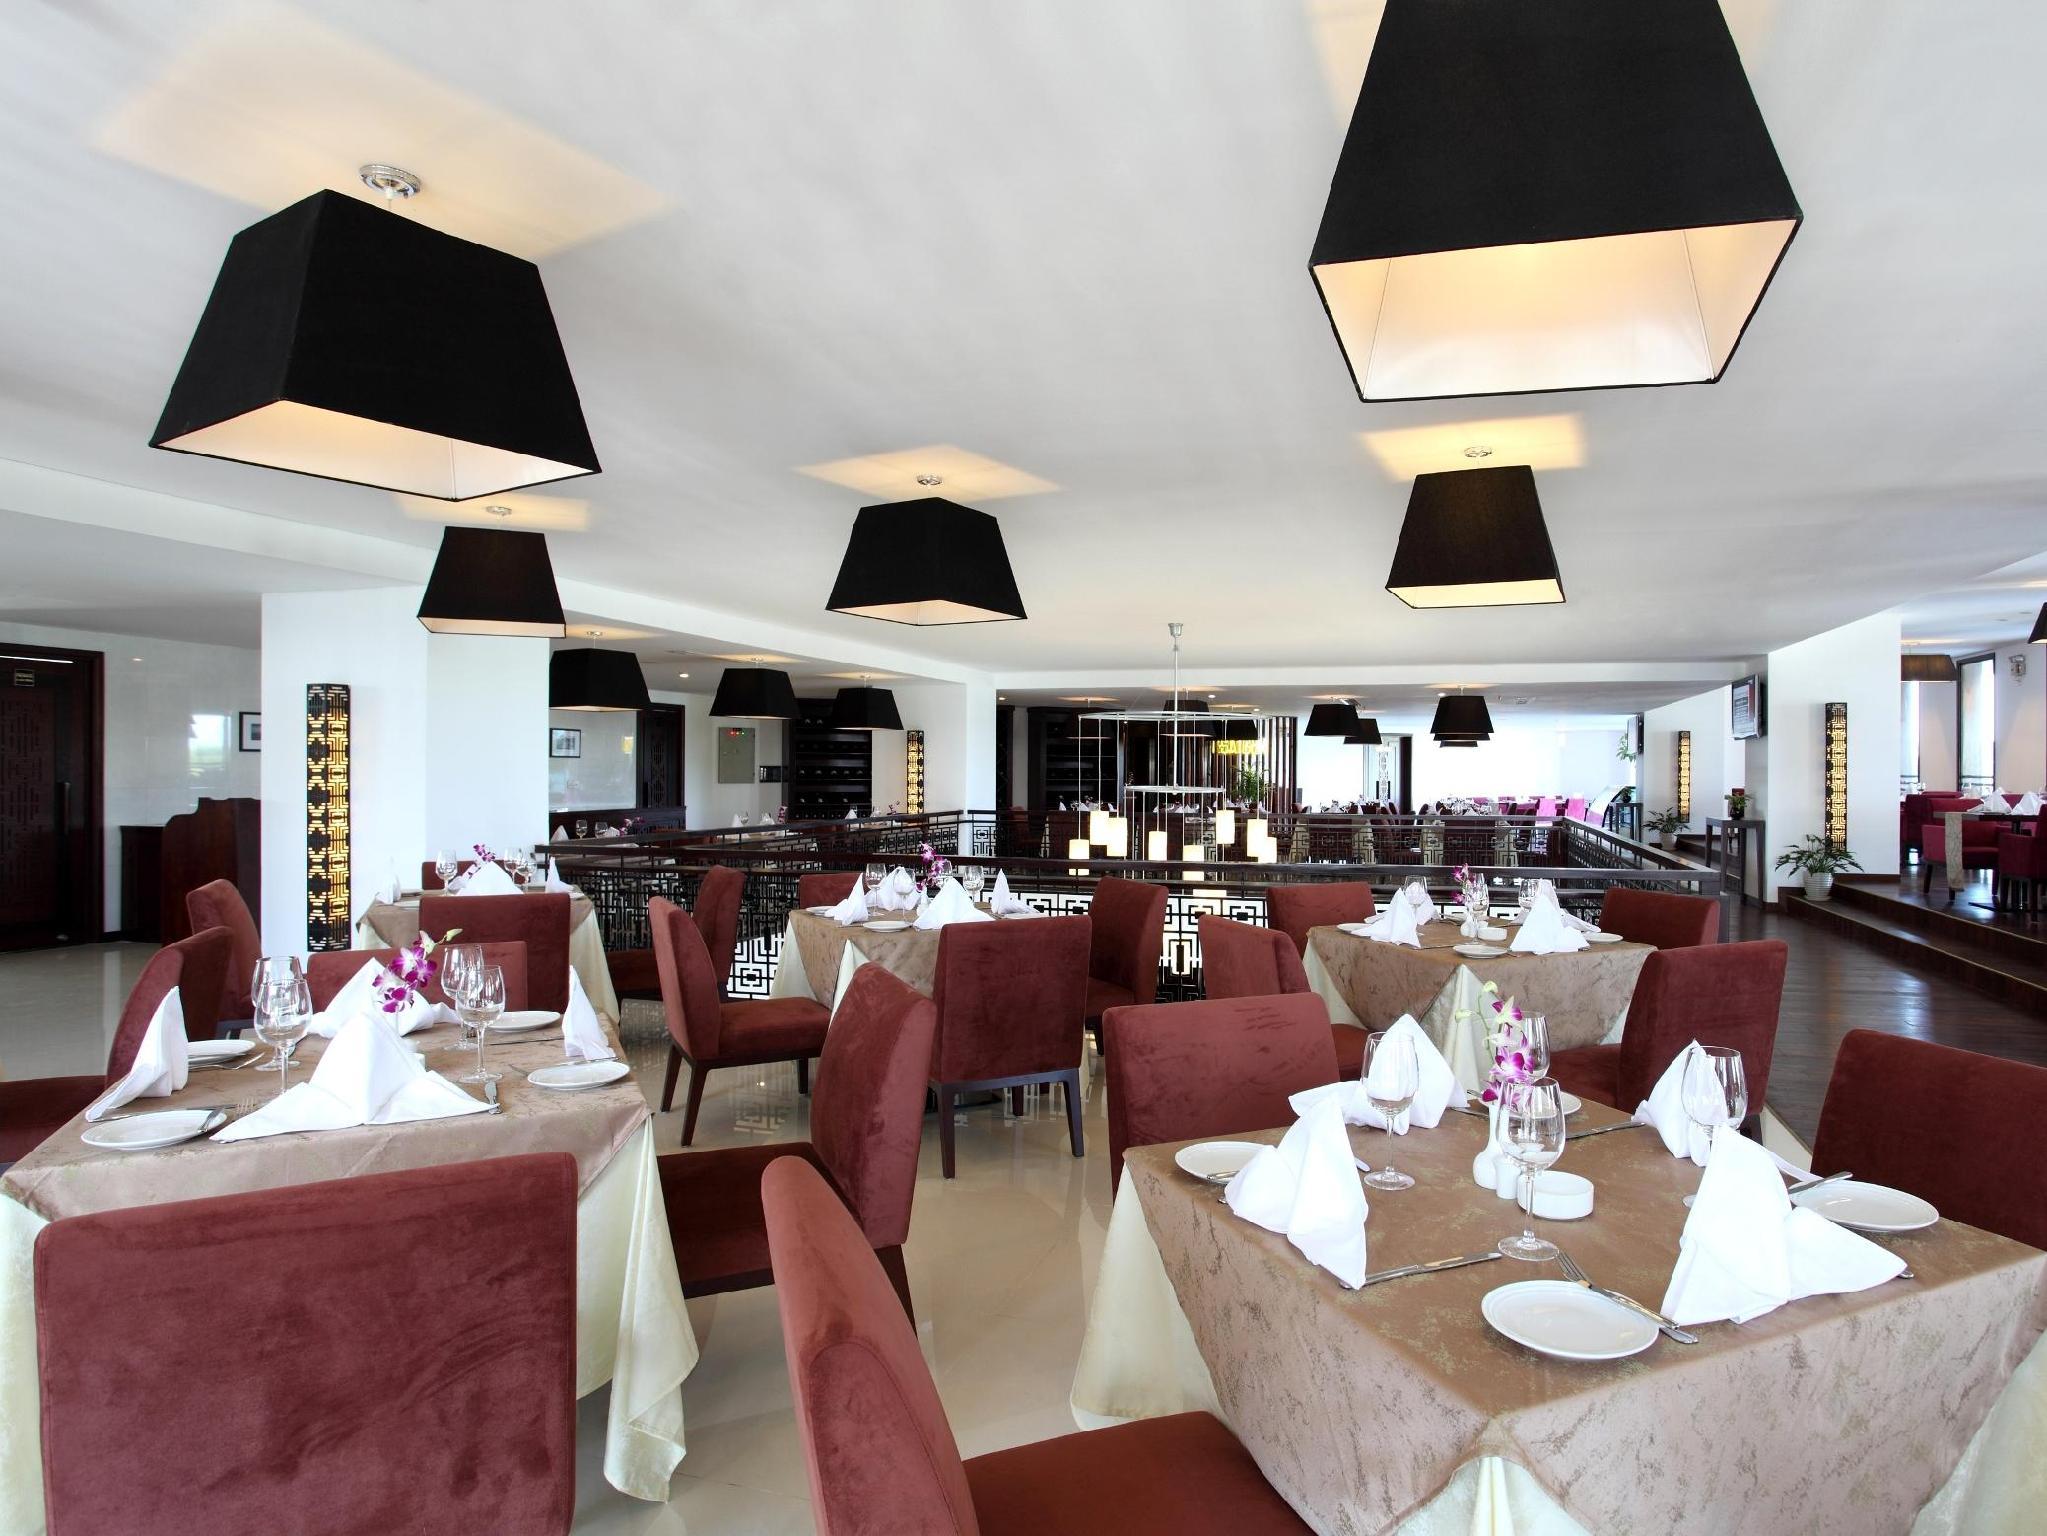 Hotel 7 BR Oceanfront Villa in Seminyak - Badung Bali 80361 Indonesia - Bali